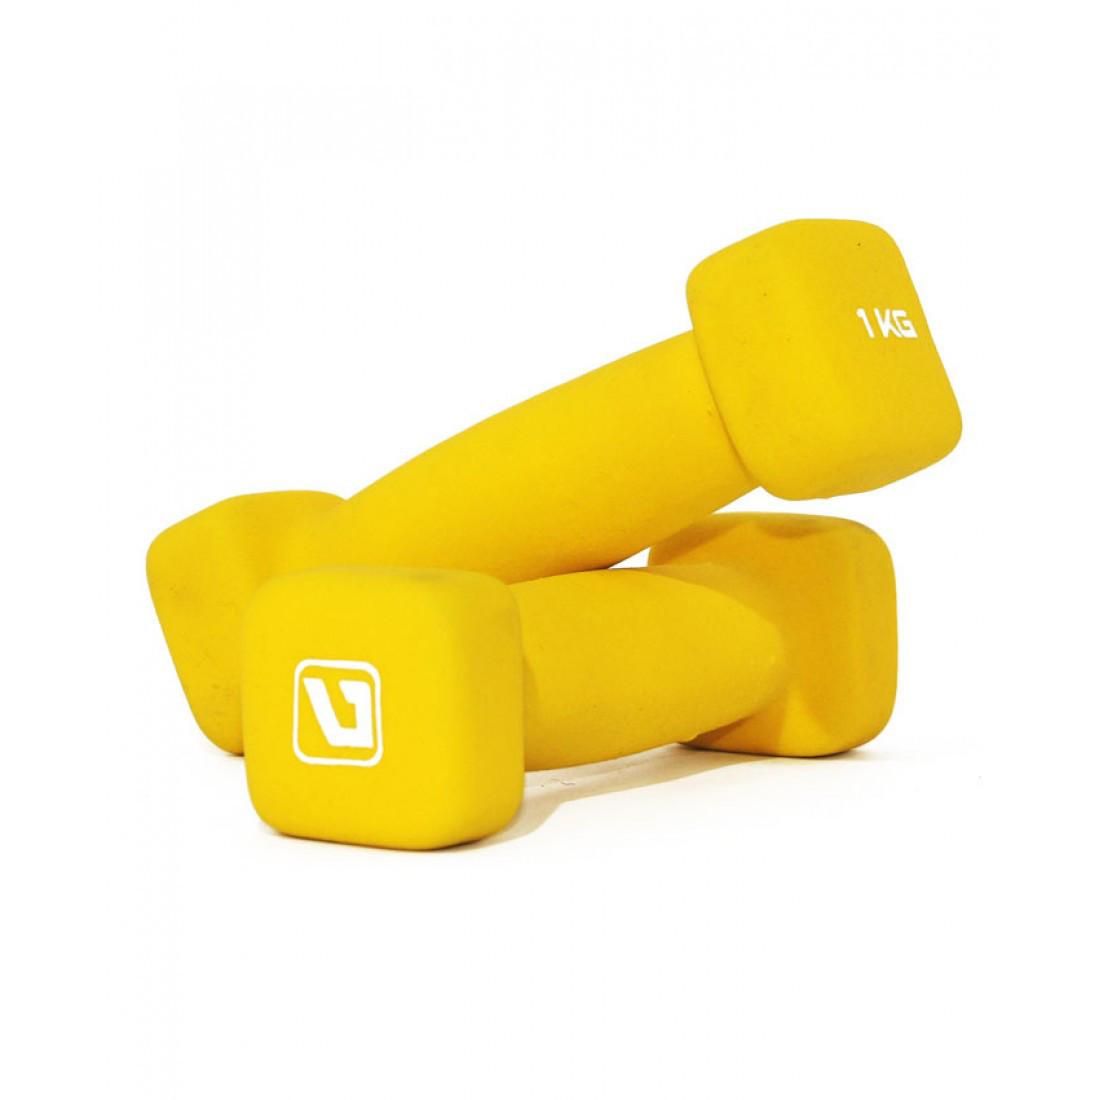 Гантели неопреновые  LiveUp SQUARE HEAD (2 шт х  1 кг)